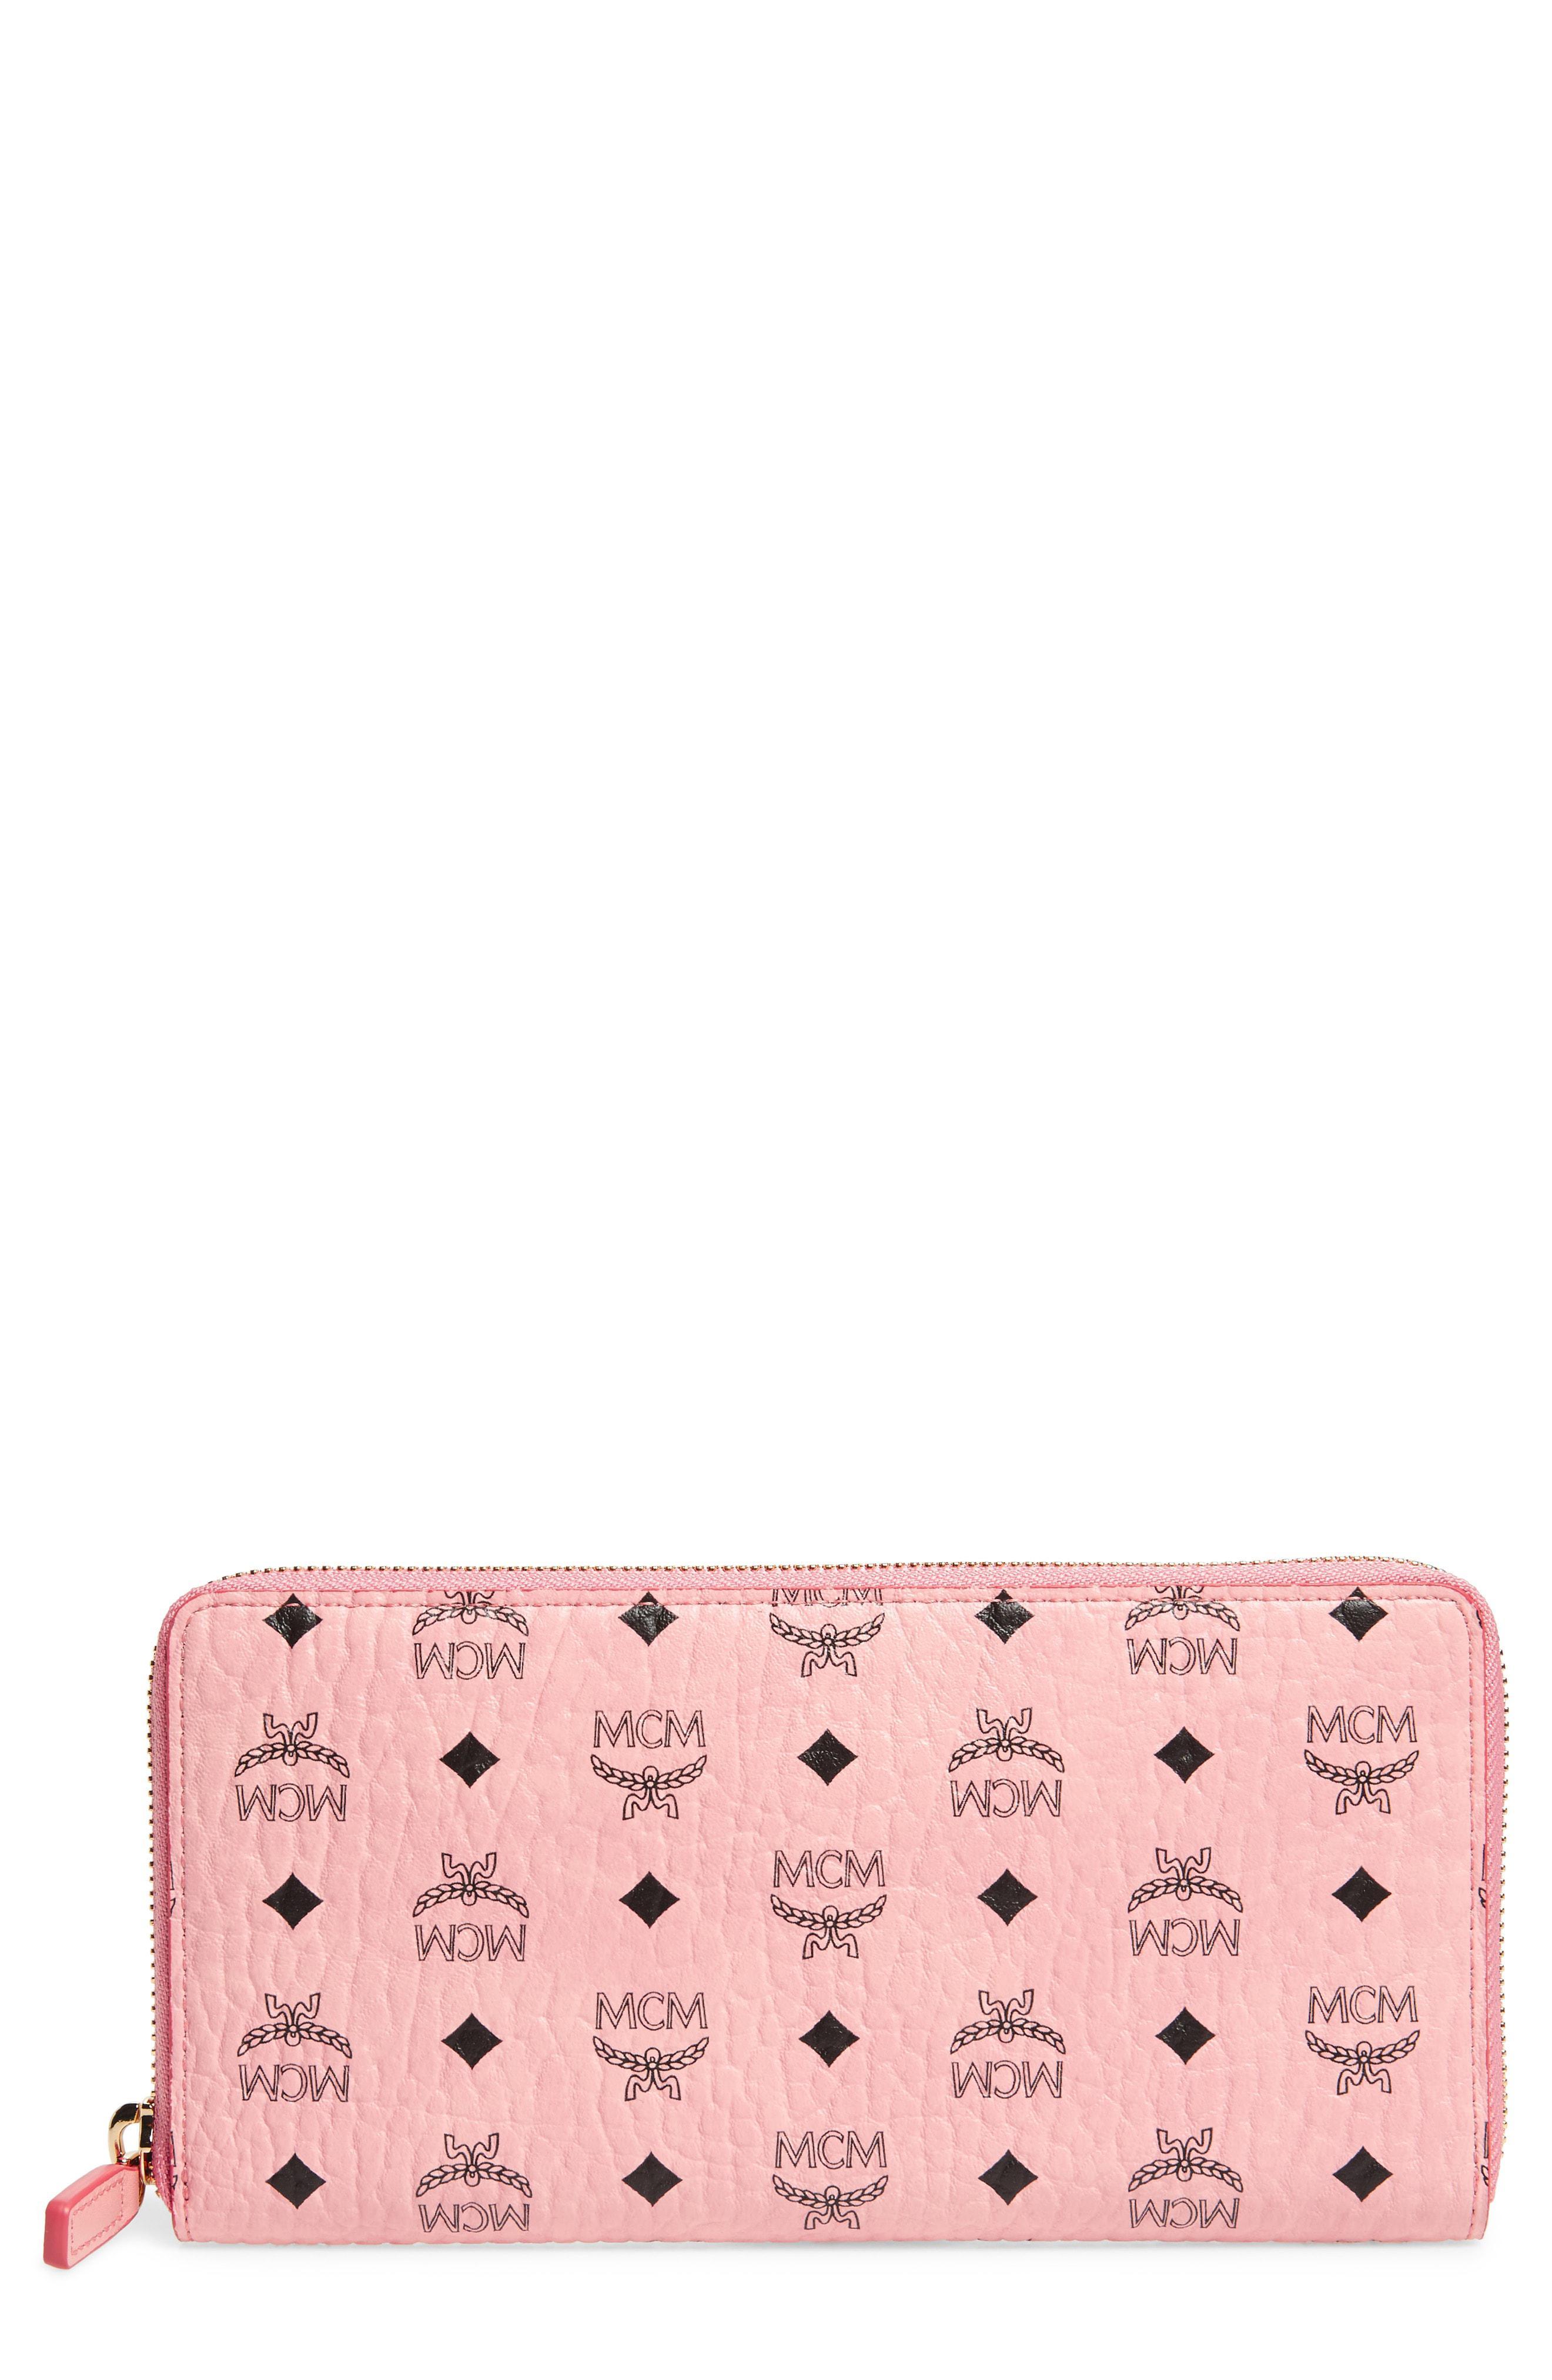 41688ed1a80 Lyst - Mcm Visetos Original Zip Around Coated Canvas Wallet in Pink ...